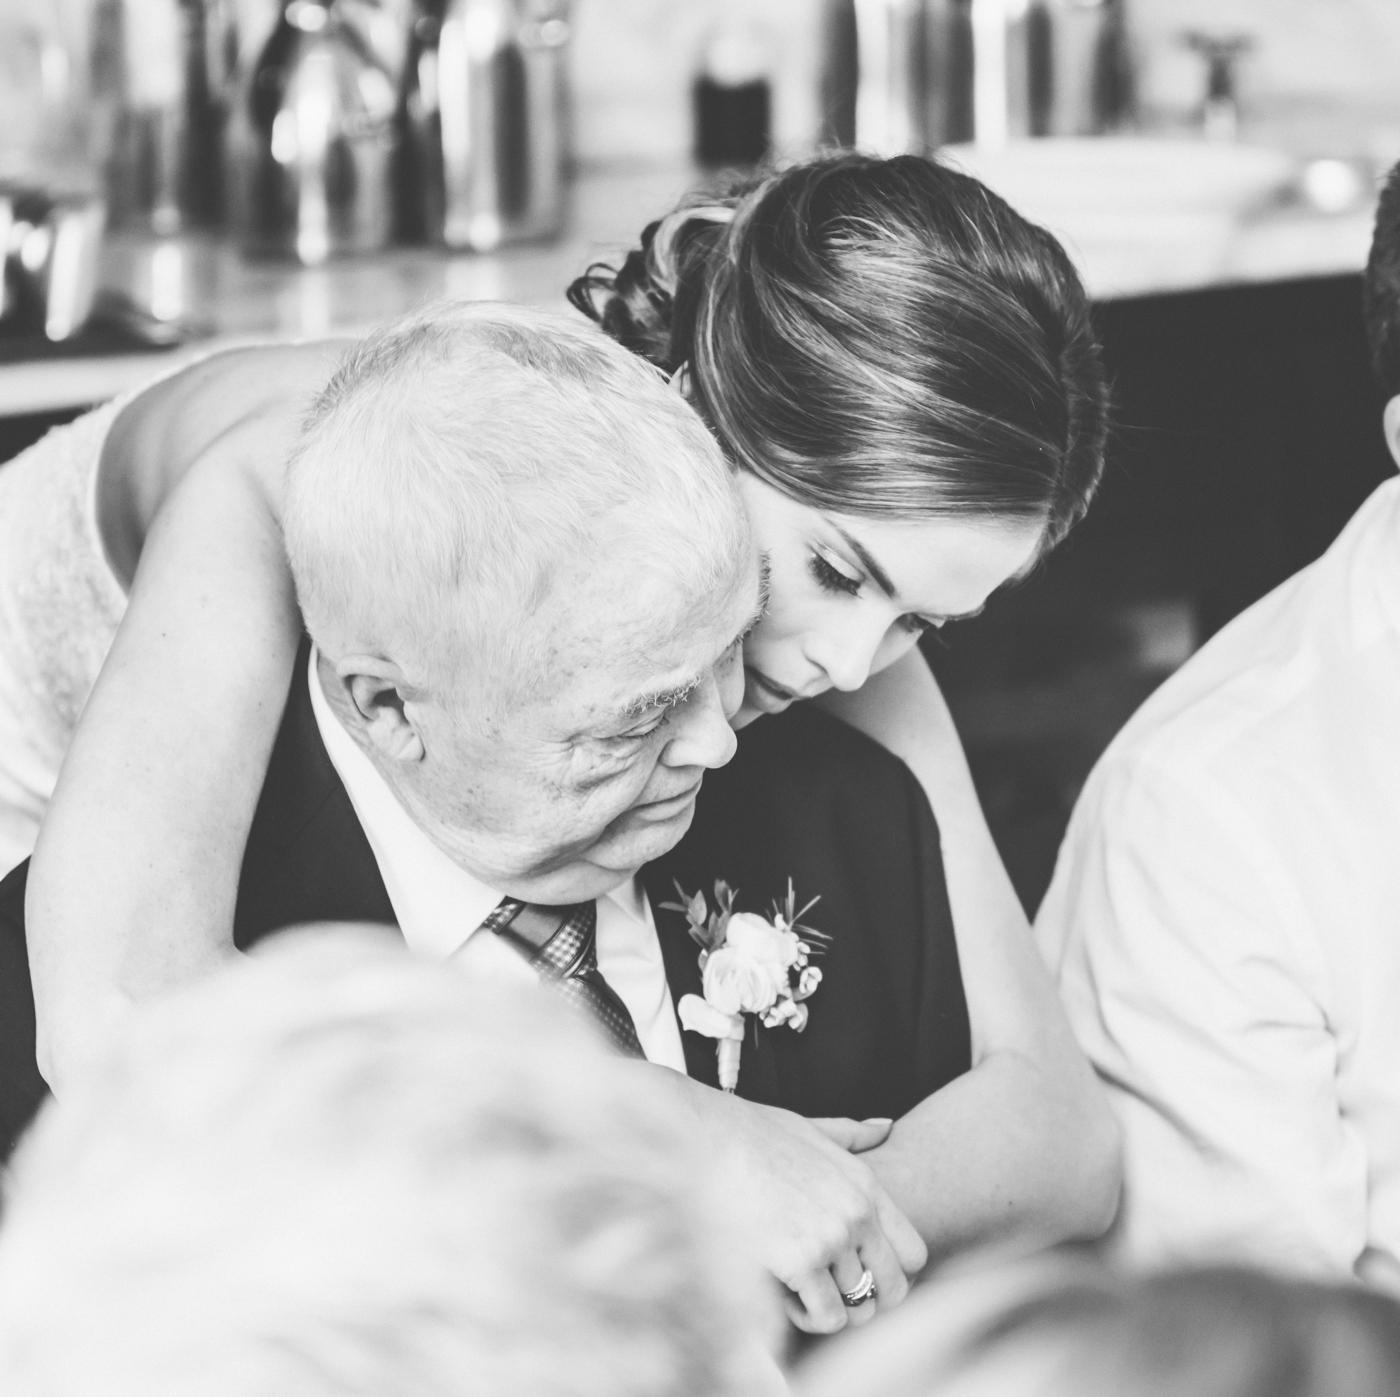 chicago-fine-art-wedding-photography-blais49